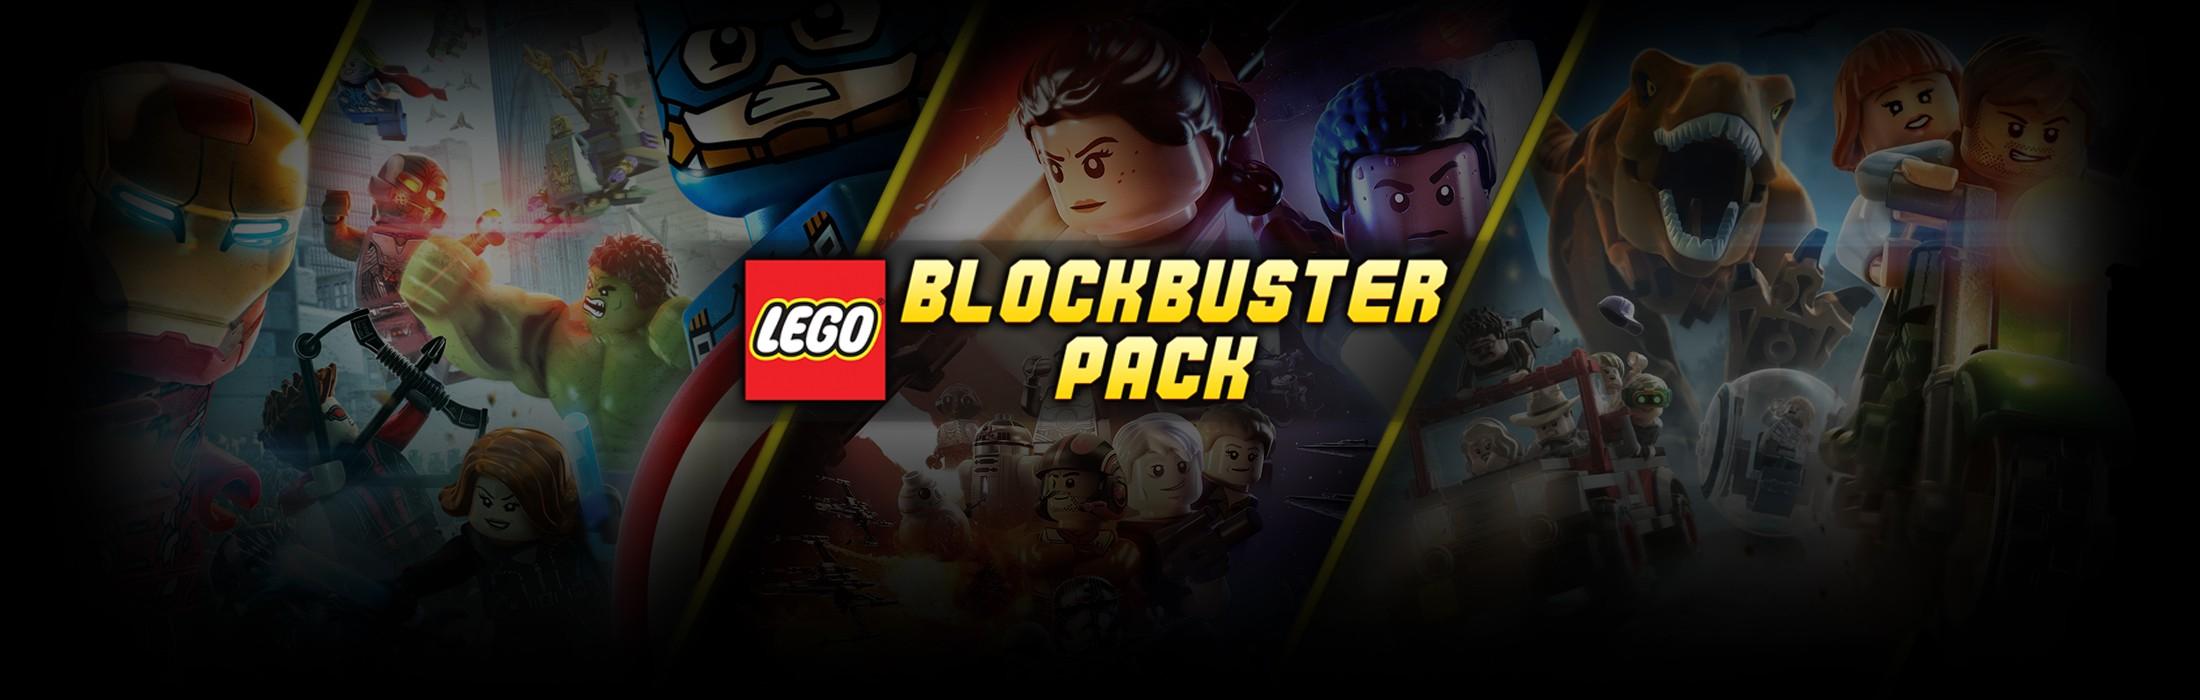 Lego Steam Bundle - The Force Awakens / Avengers / Jurassic World - $11.99